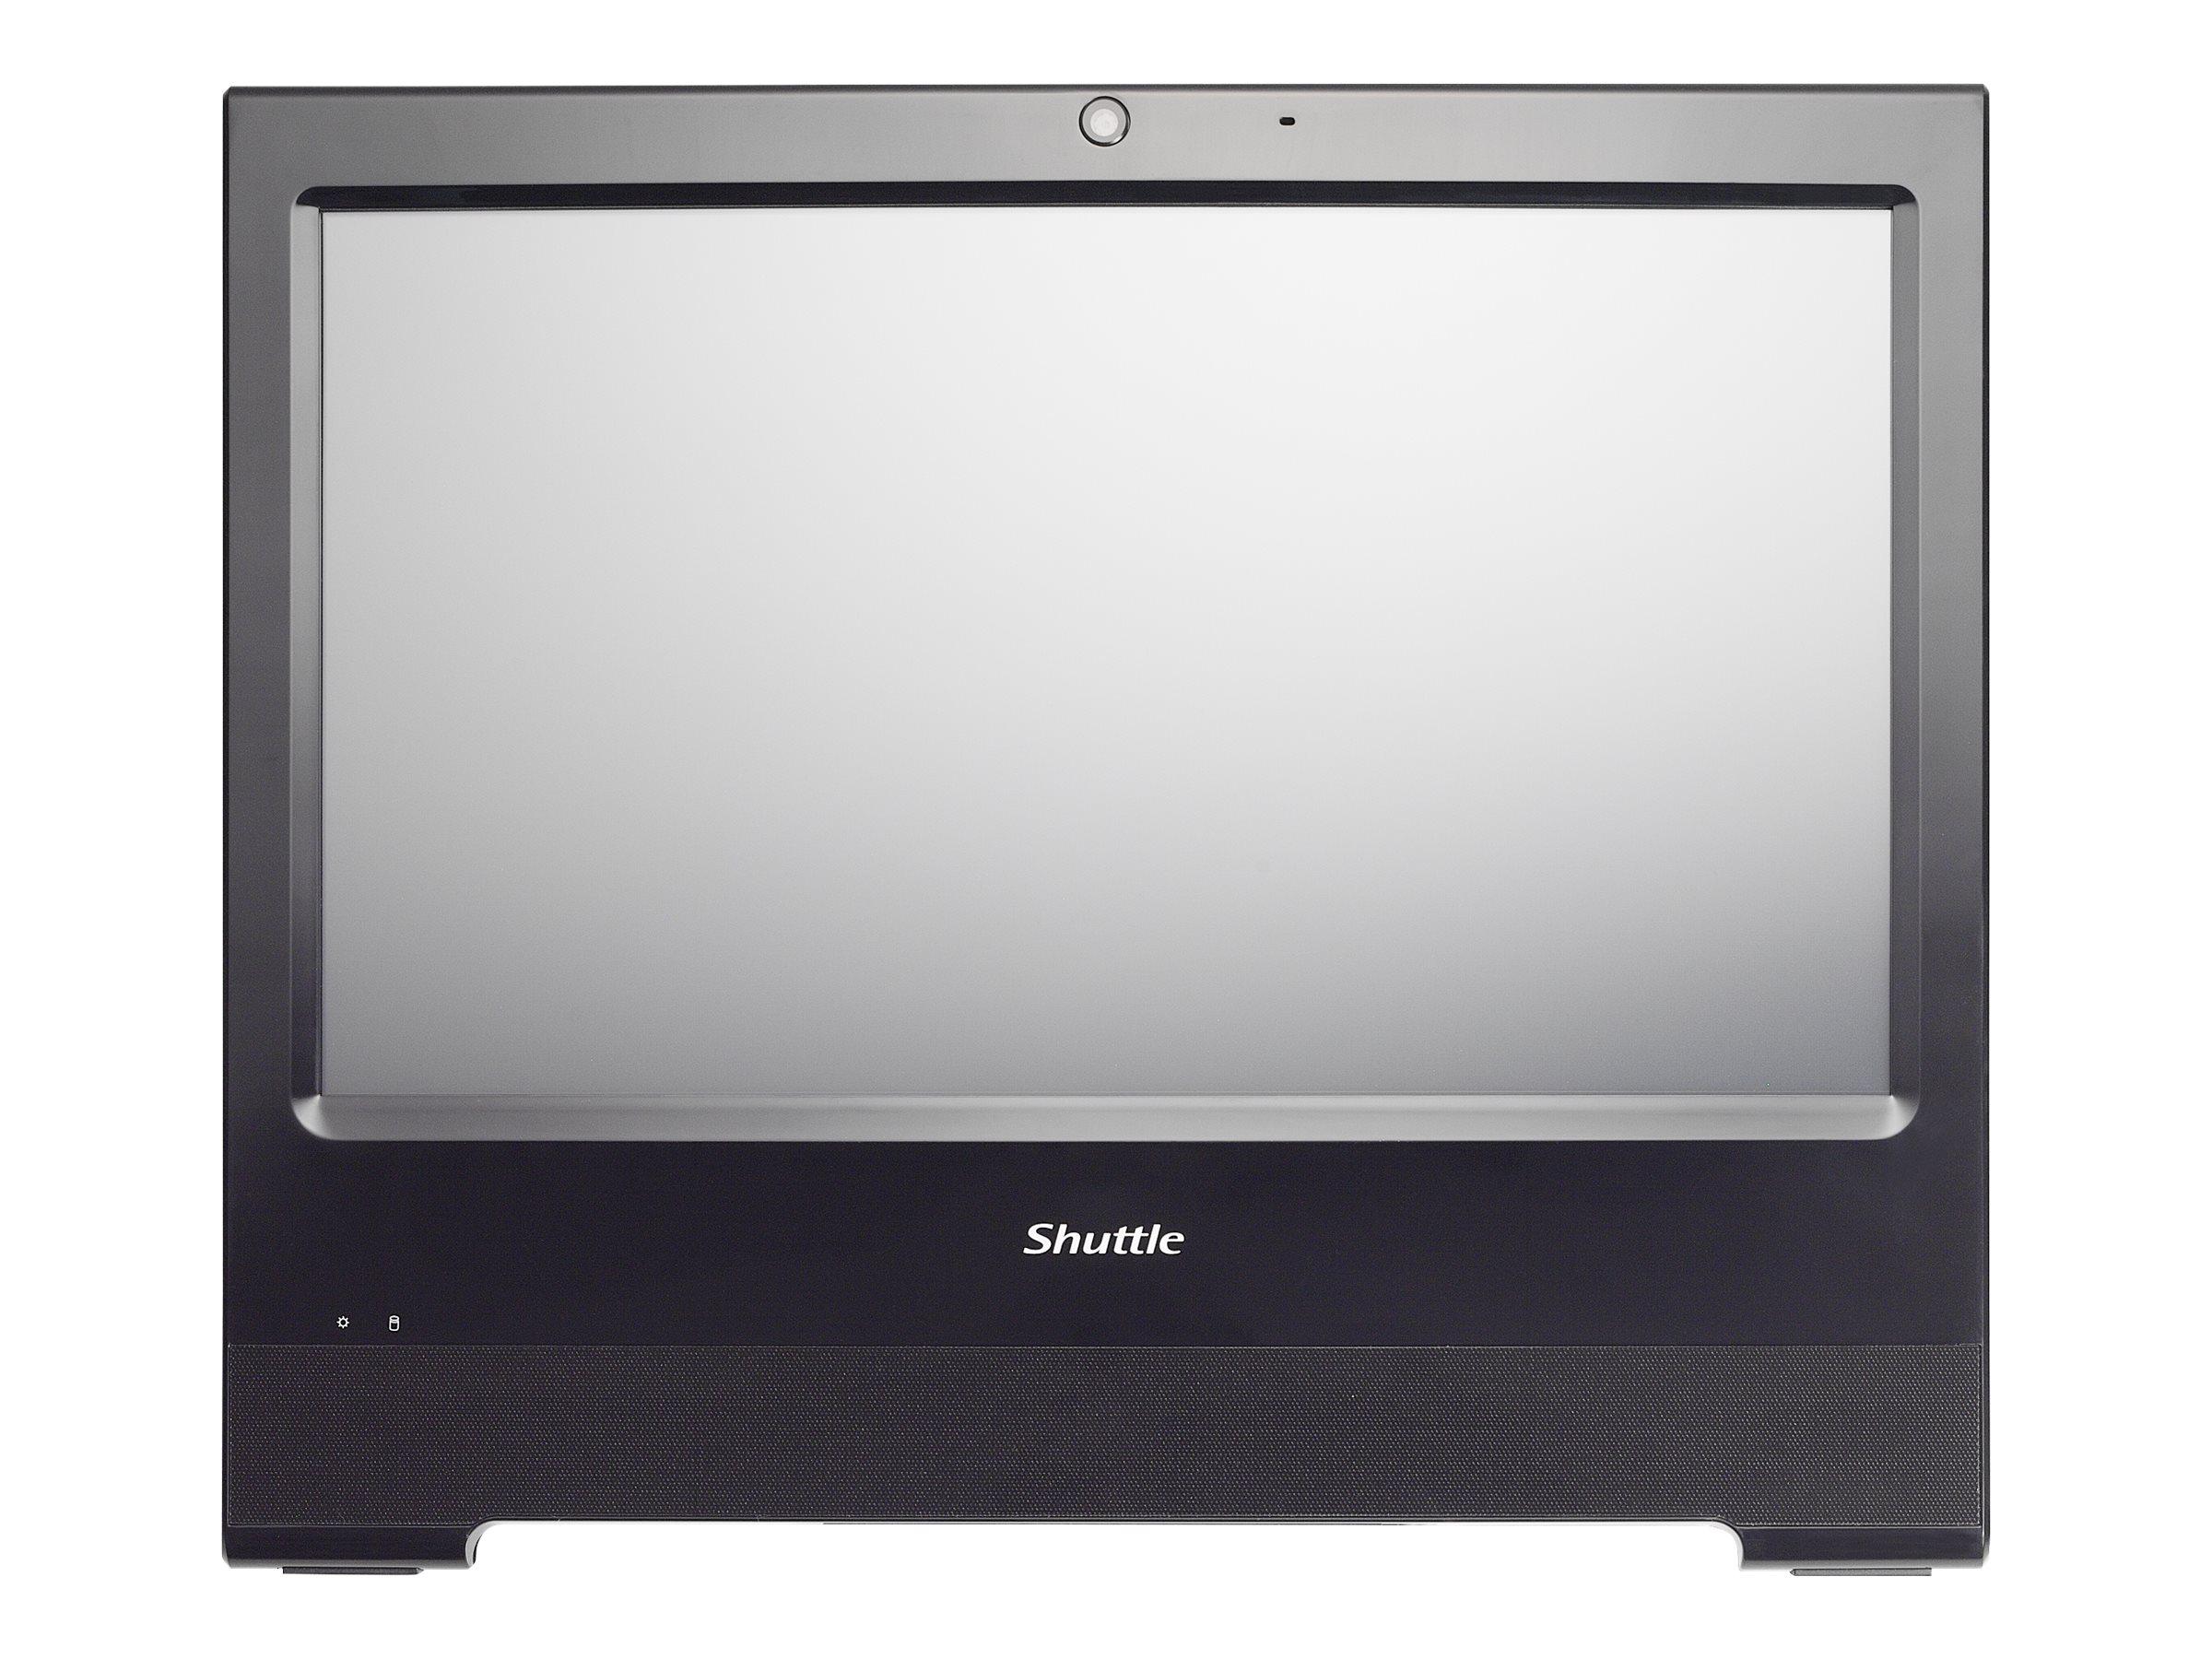 Shuttle XPC X50V7L - Barebone - All-in-One (Komplettlösung) - 1 x Celeron 4205U / 1.8 GHz ULV - RAM 0 GB - UHD Graphics